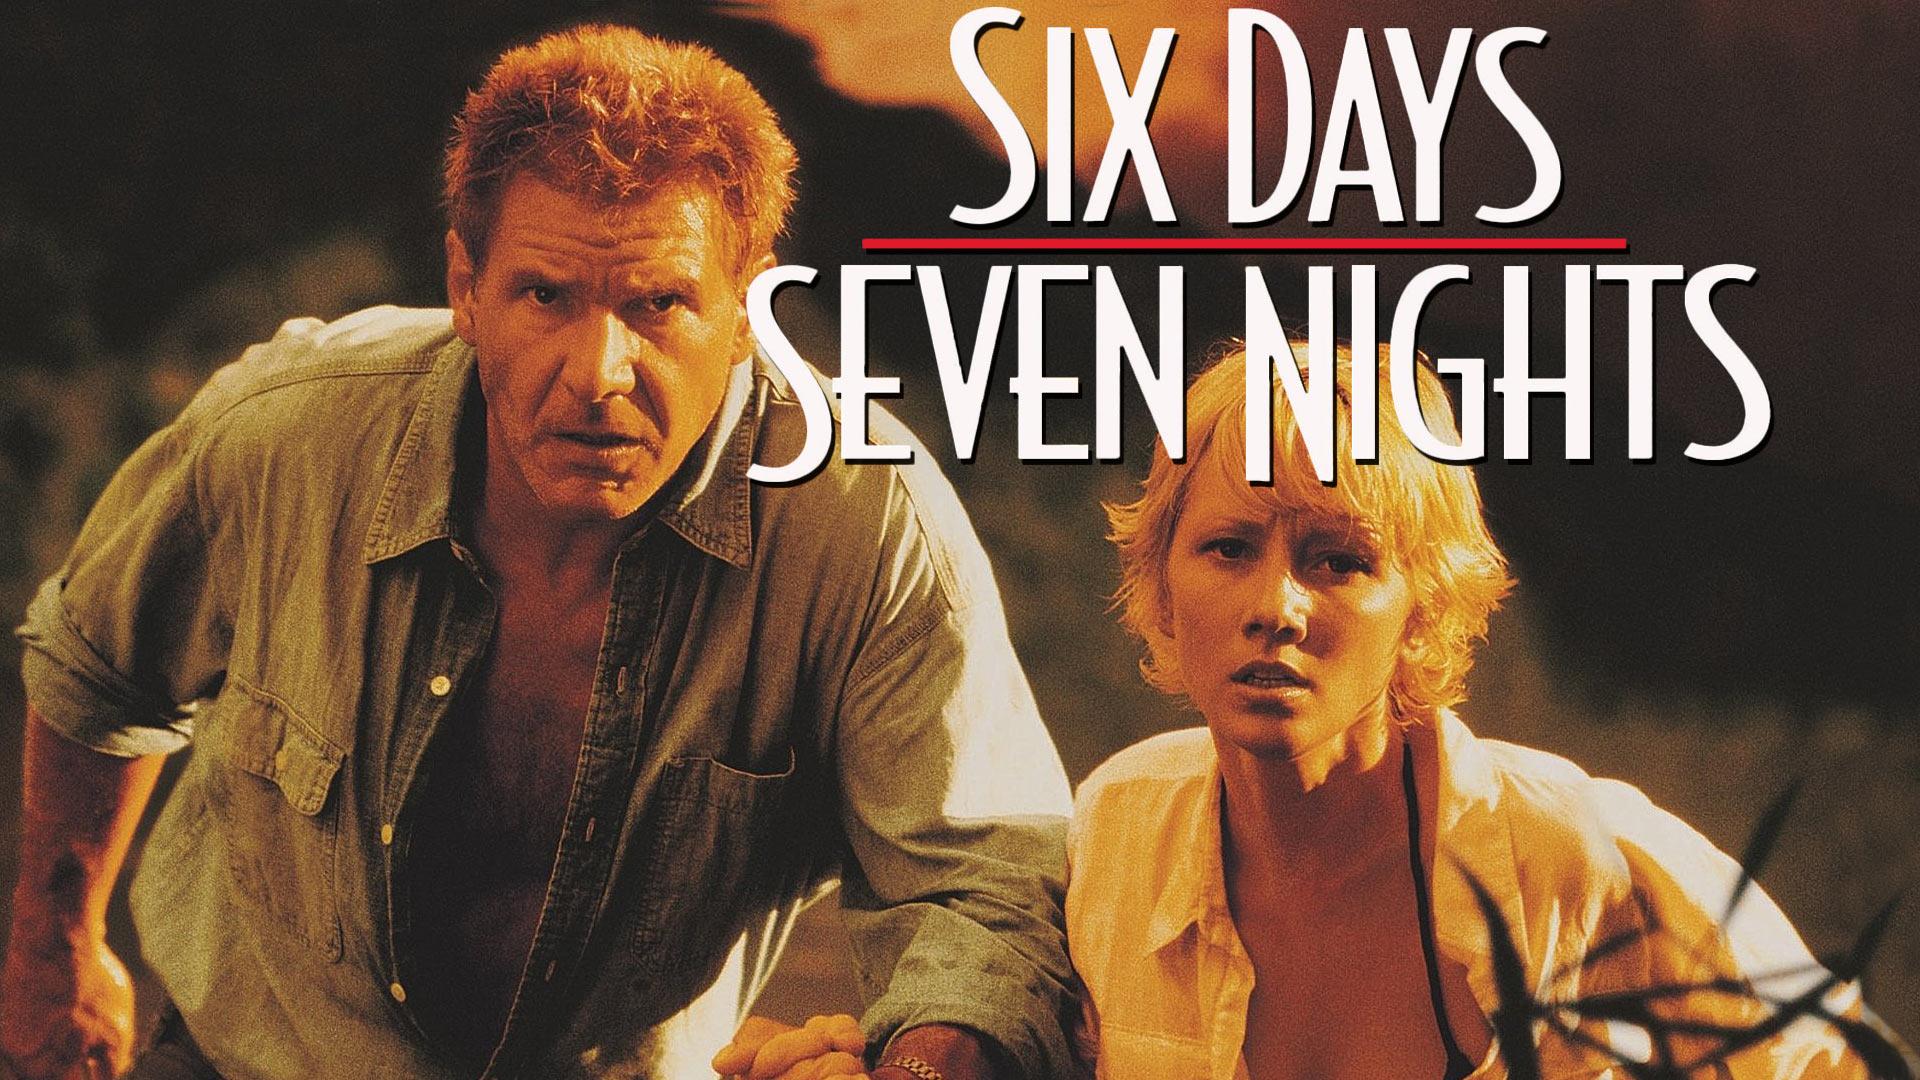 Six Days, Seven Nights